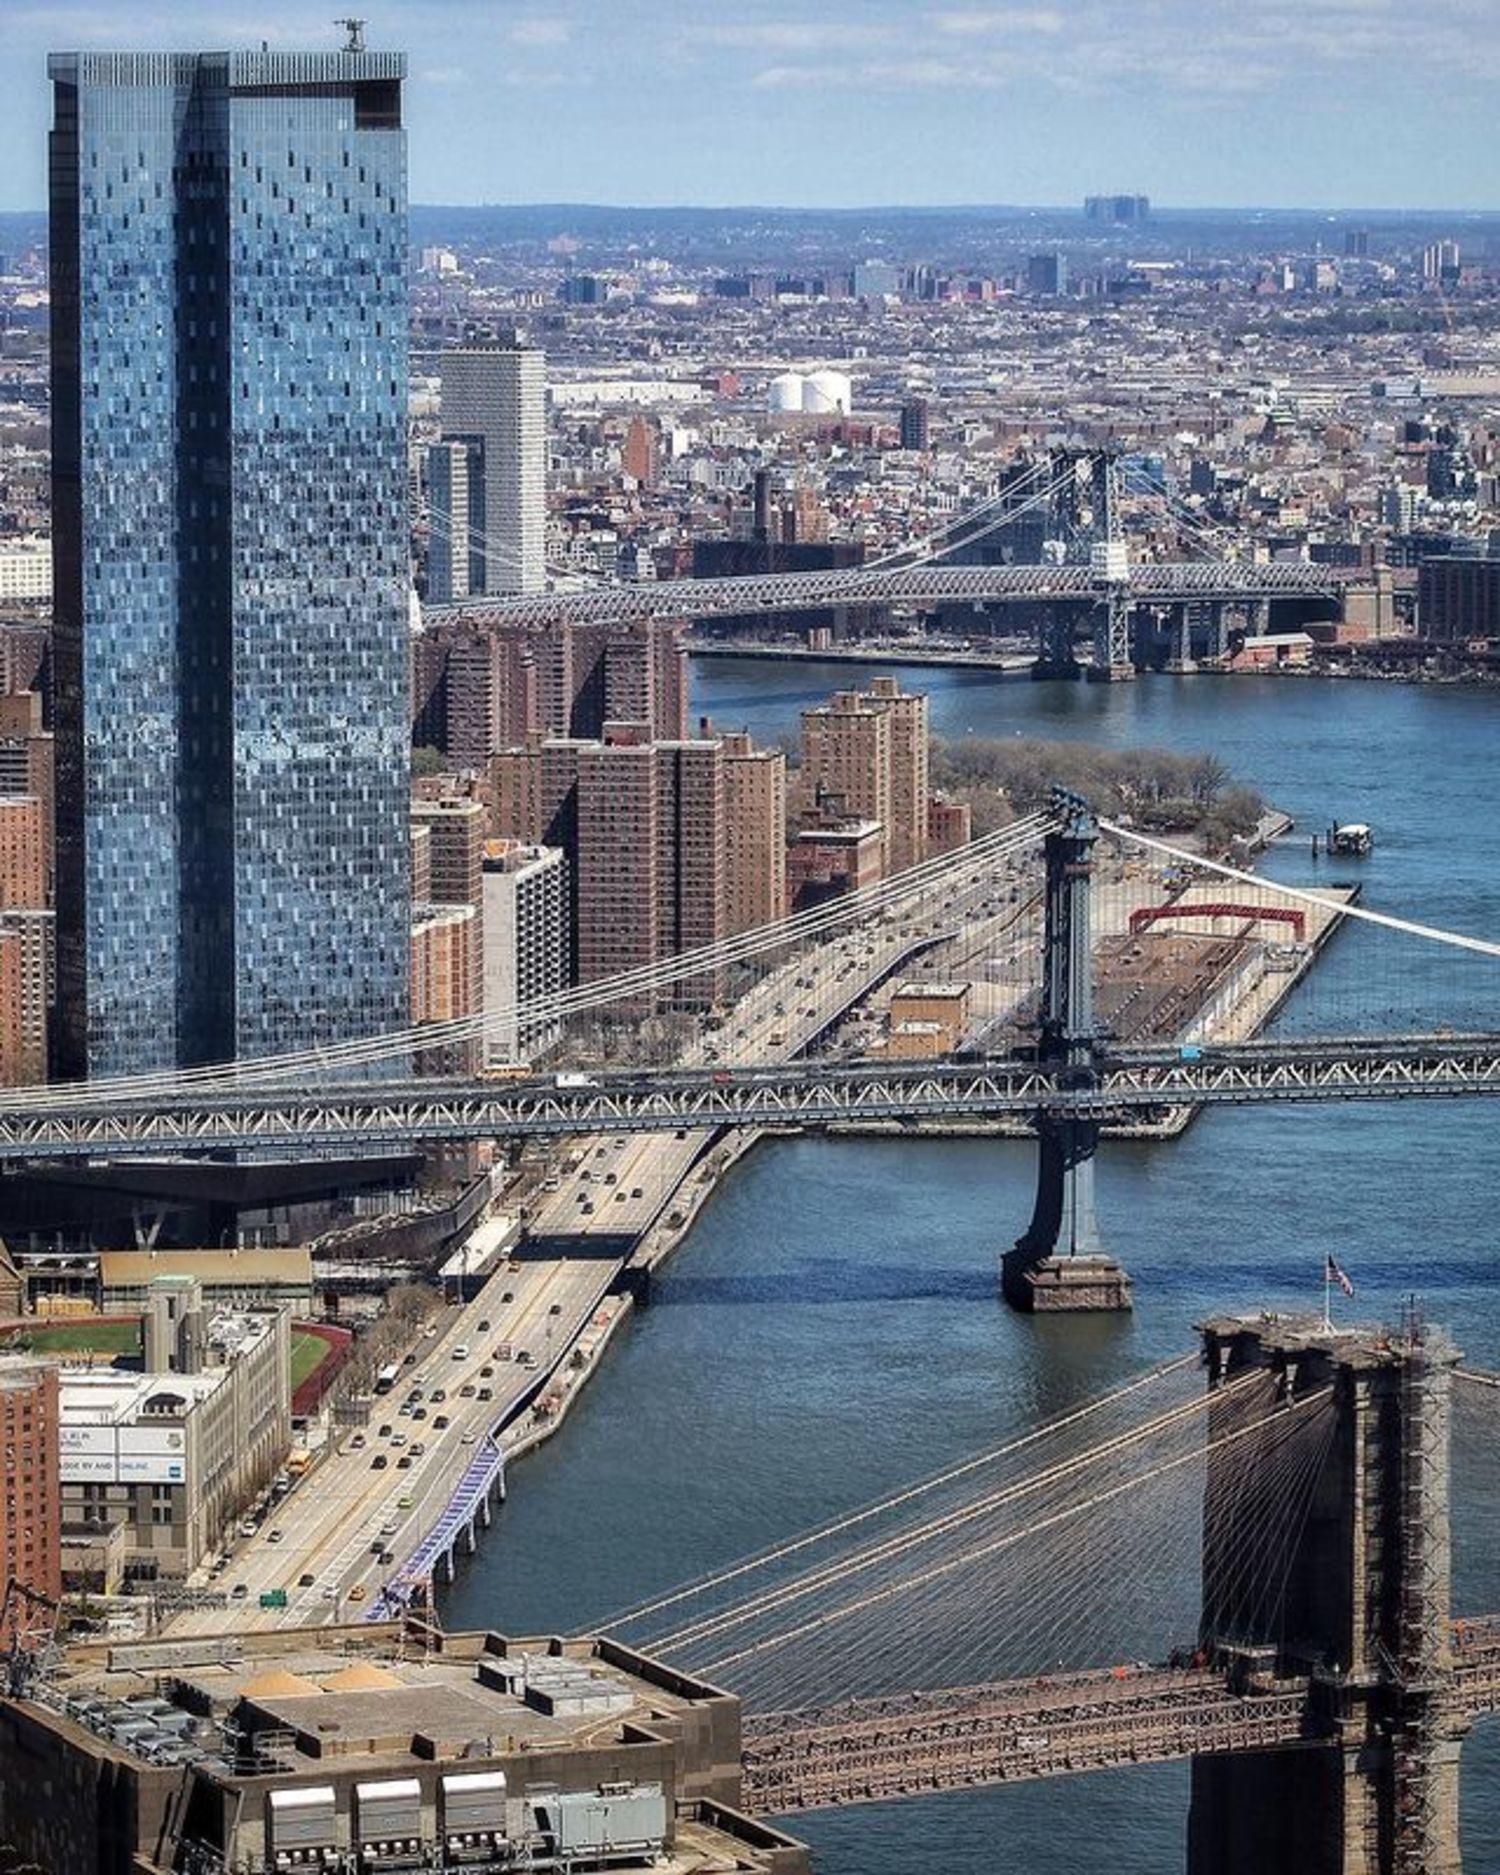 Williamsburg, Manhattan, and Brooklyn Bridges on the East River, New York